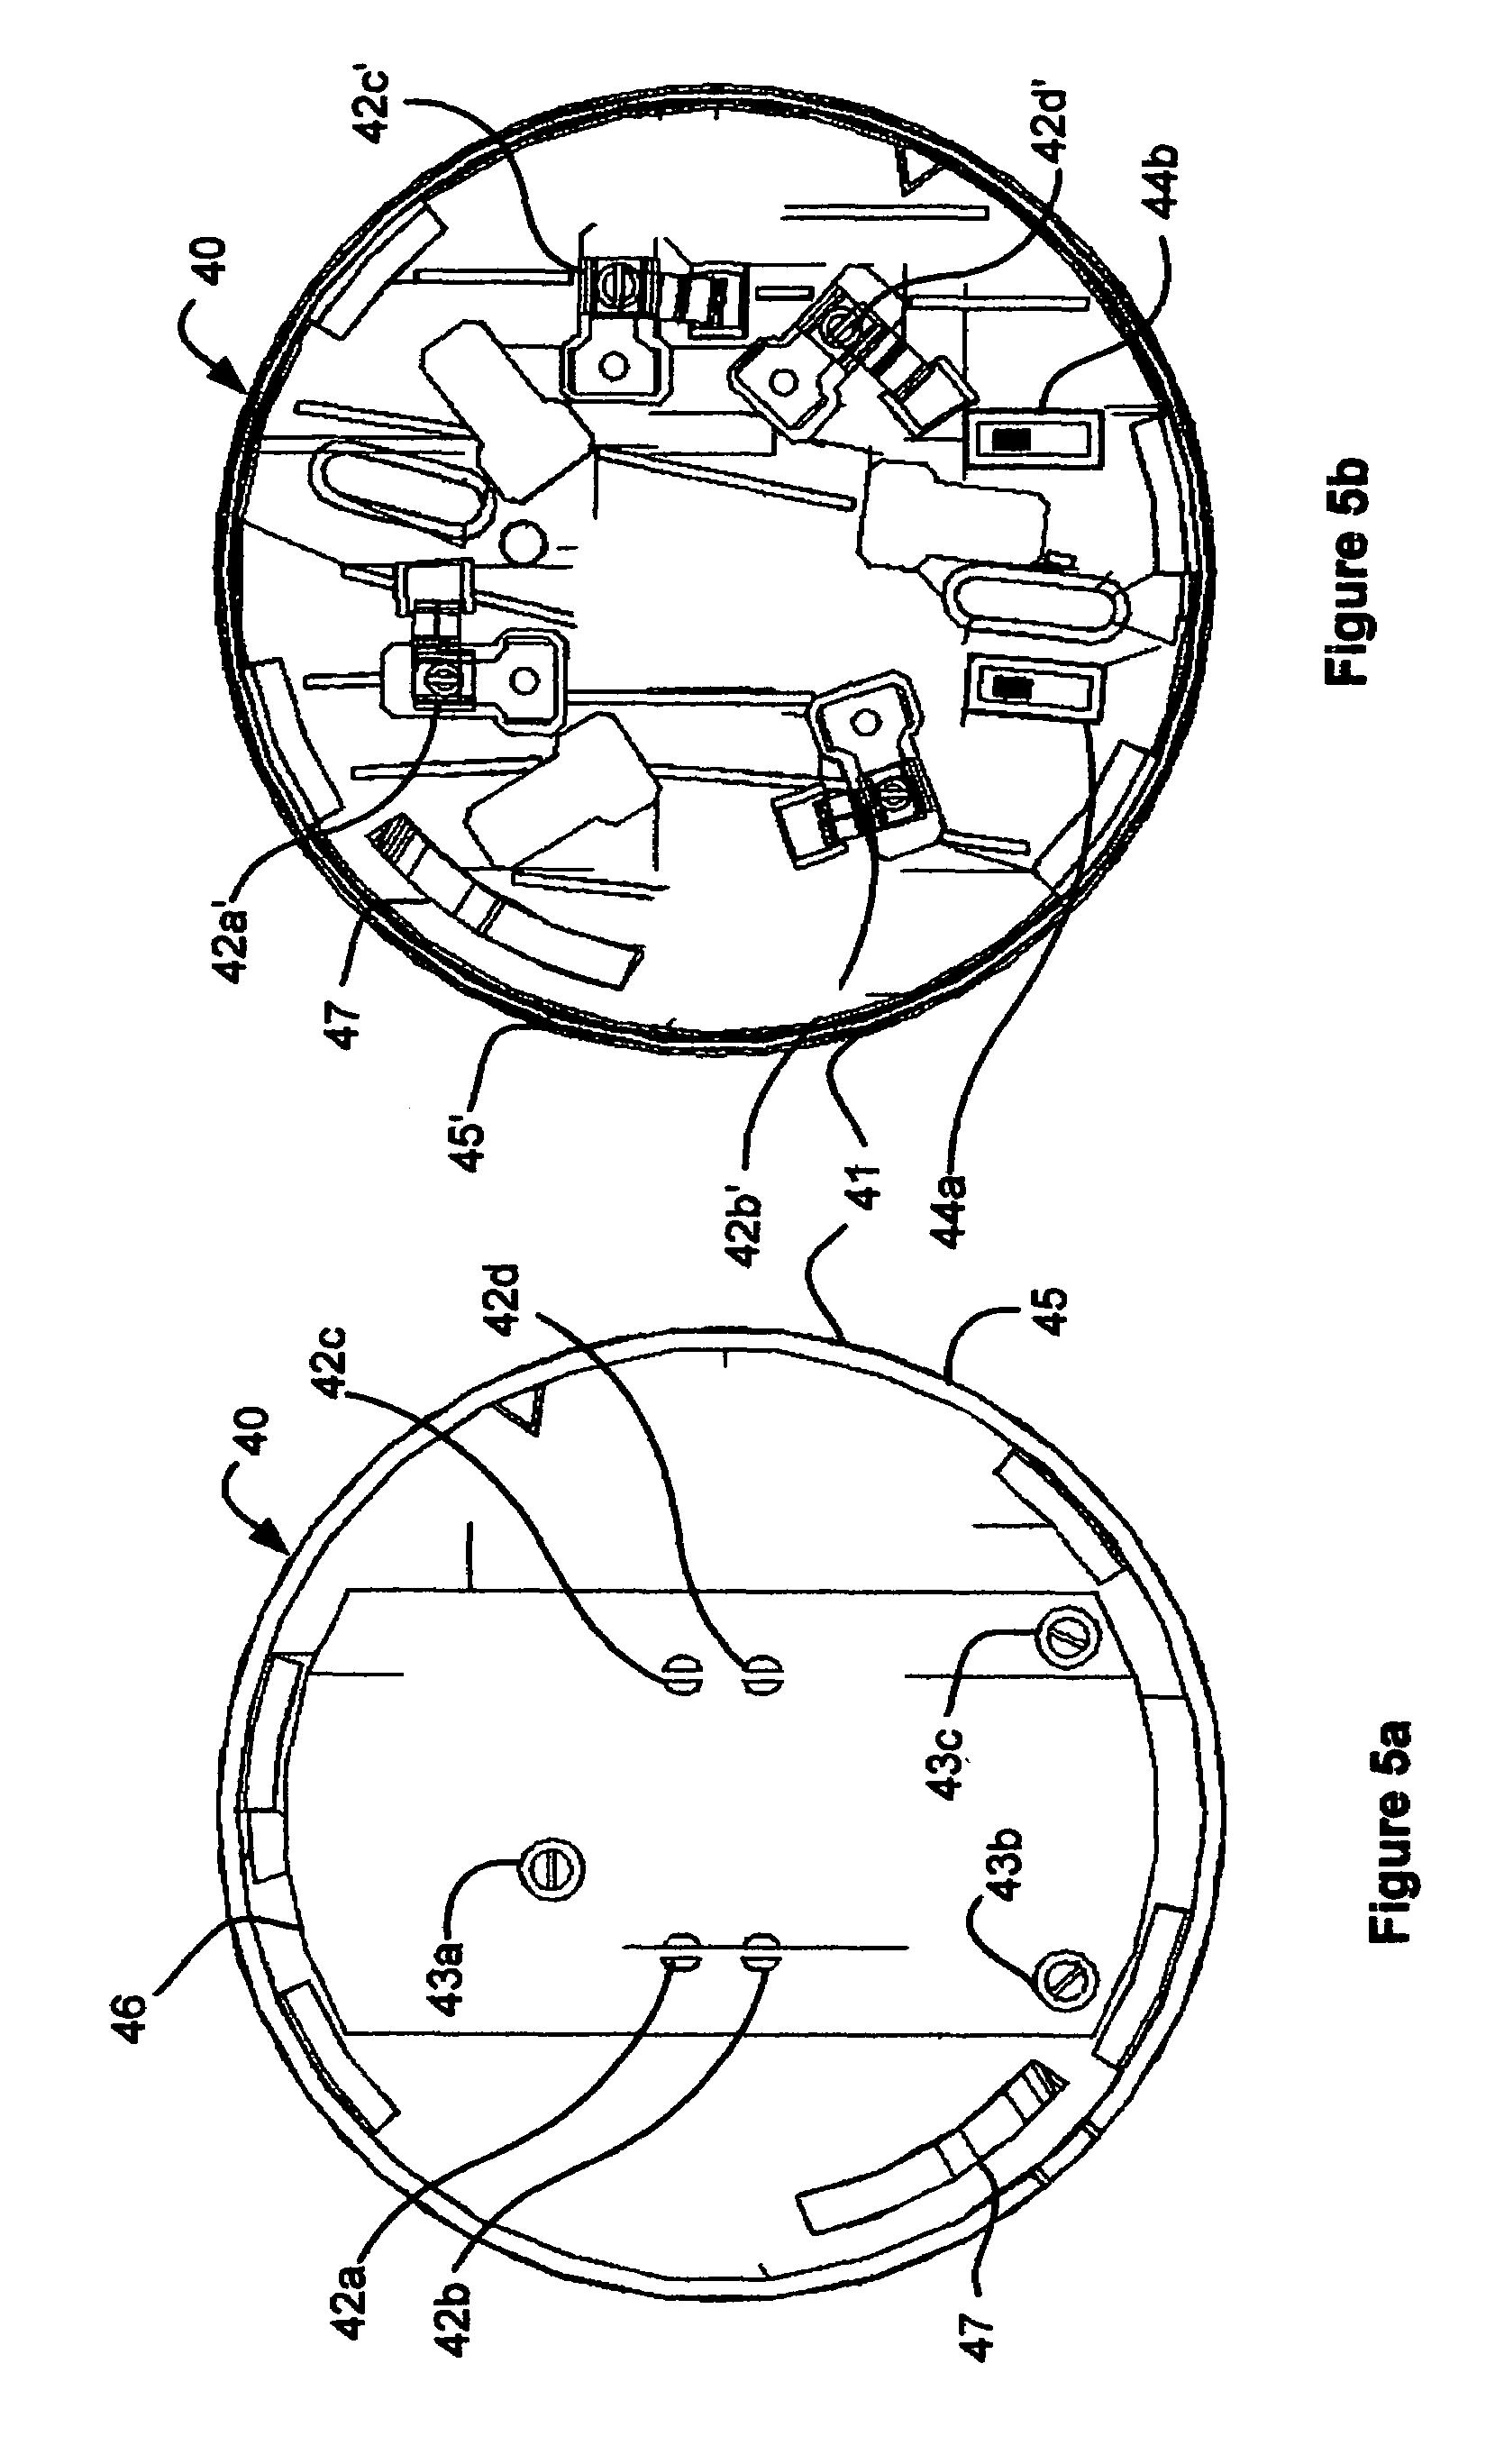 Cooper Smoke Detector Wiring Diagram : 36 Wiring Diagram